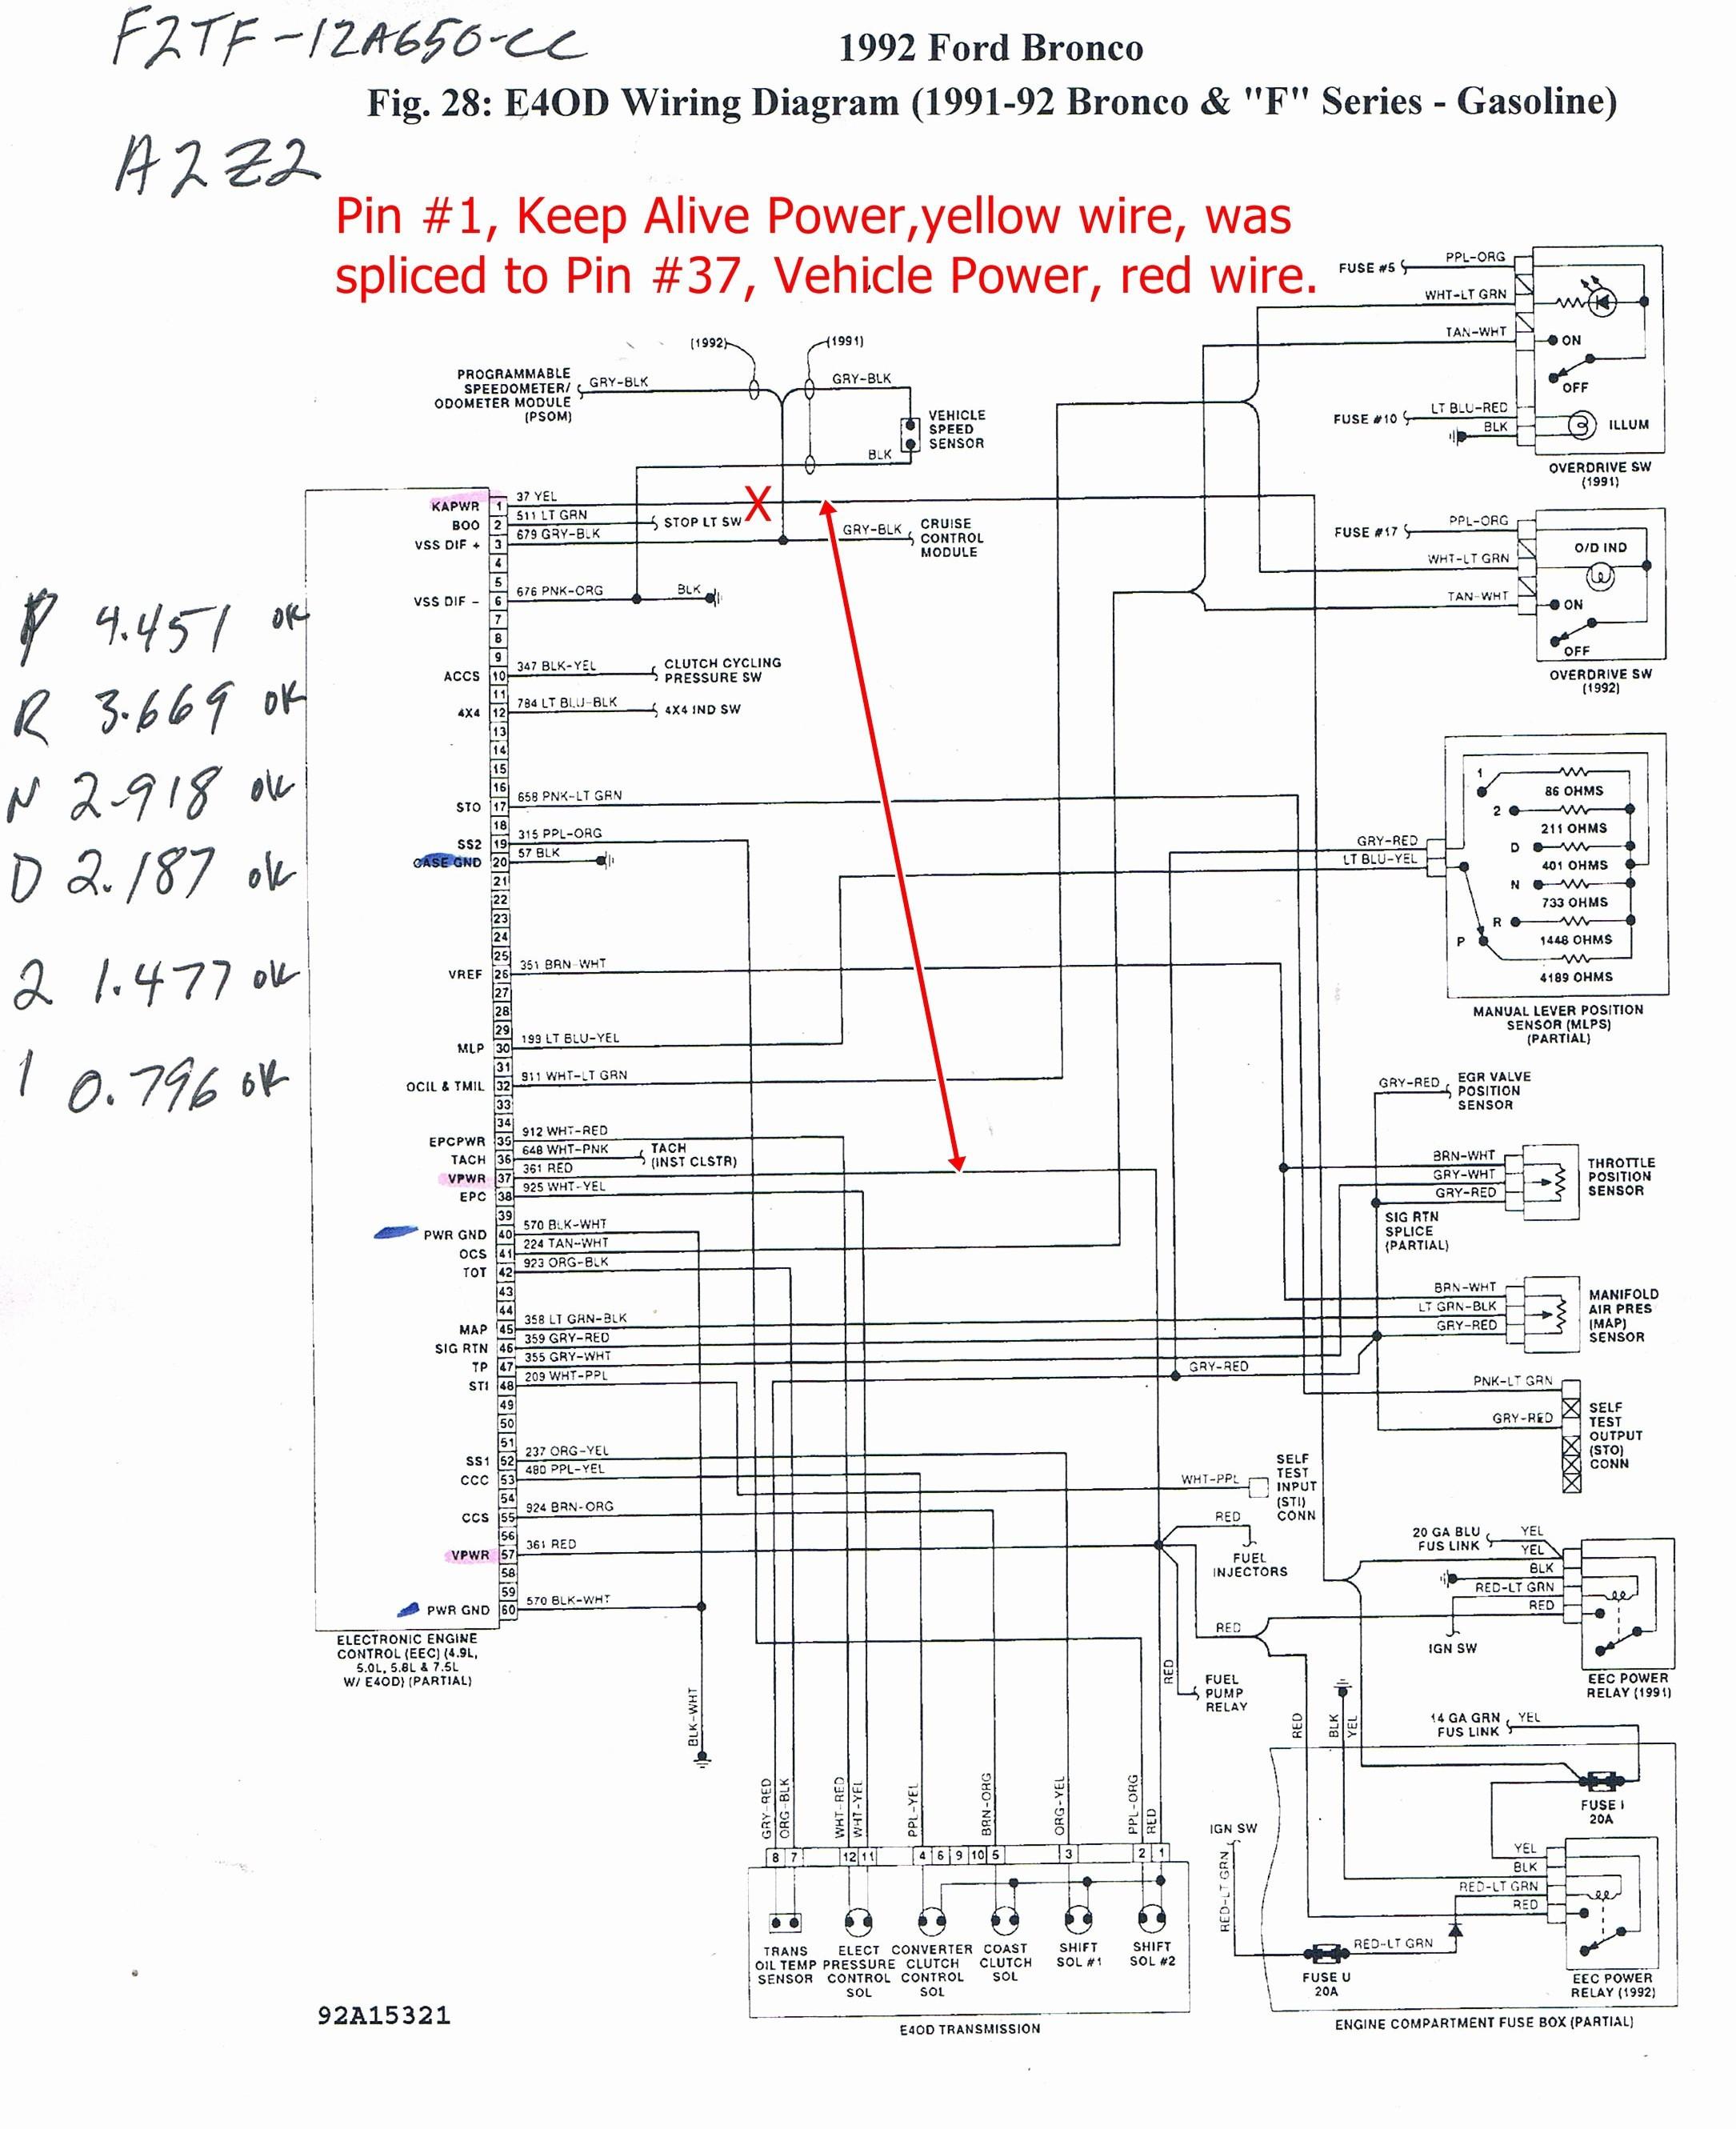 diagram 4l60e neutral safety switch wiring diagram 4l60e wiring rh pepsicolive co